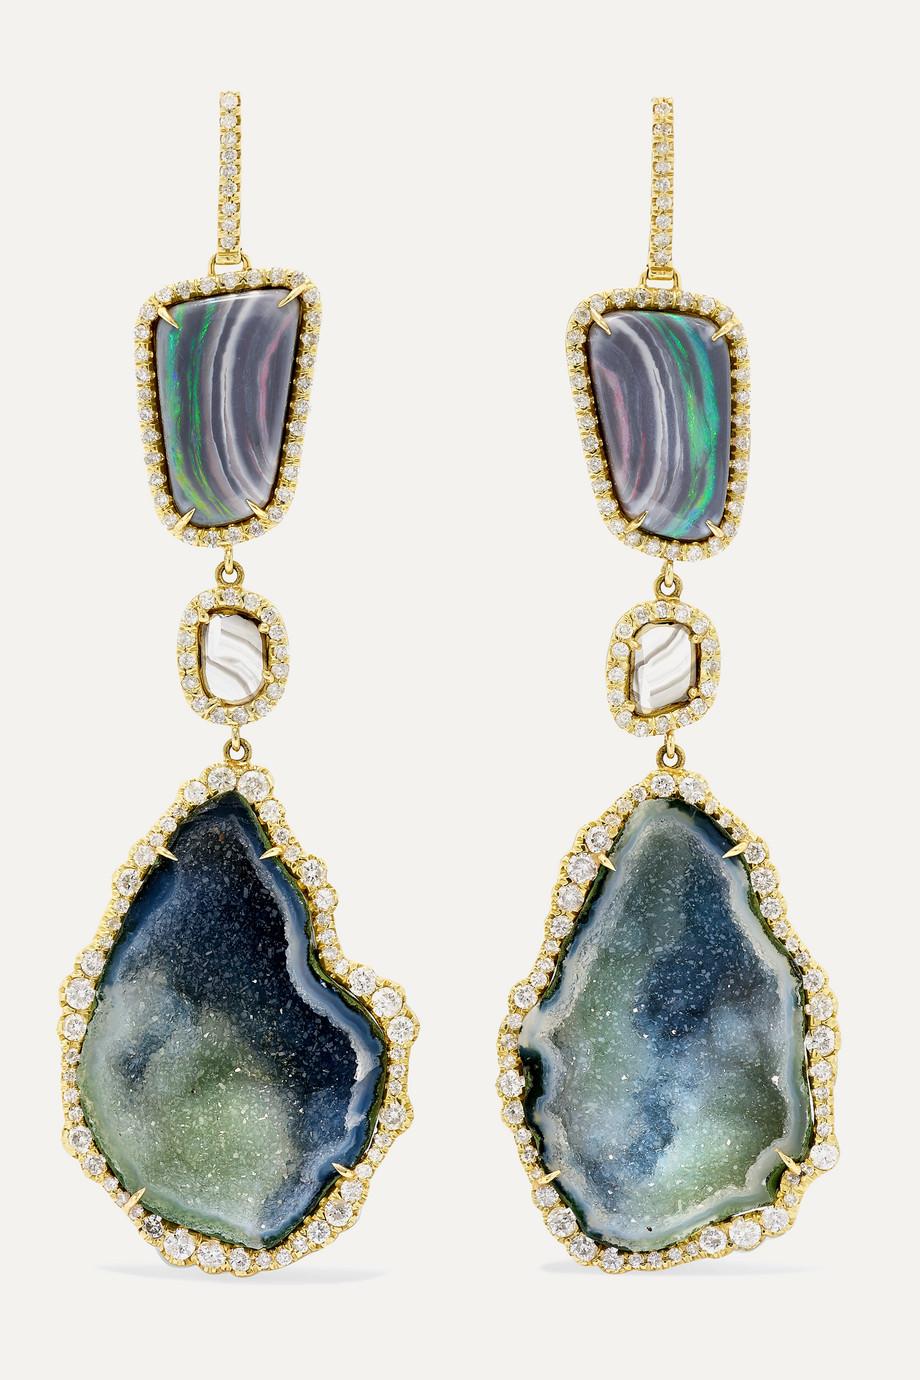 Kimberly McDonald 18-karat green gold multi-stone earrings